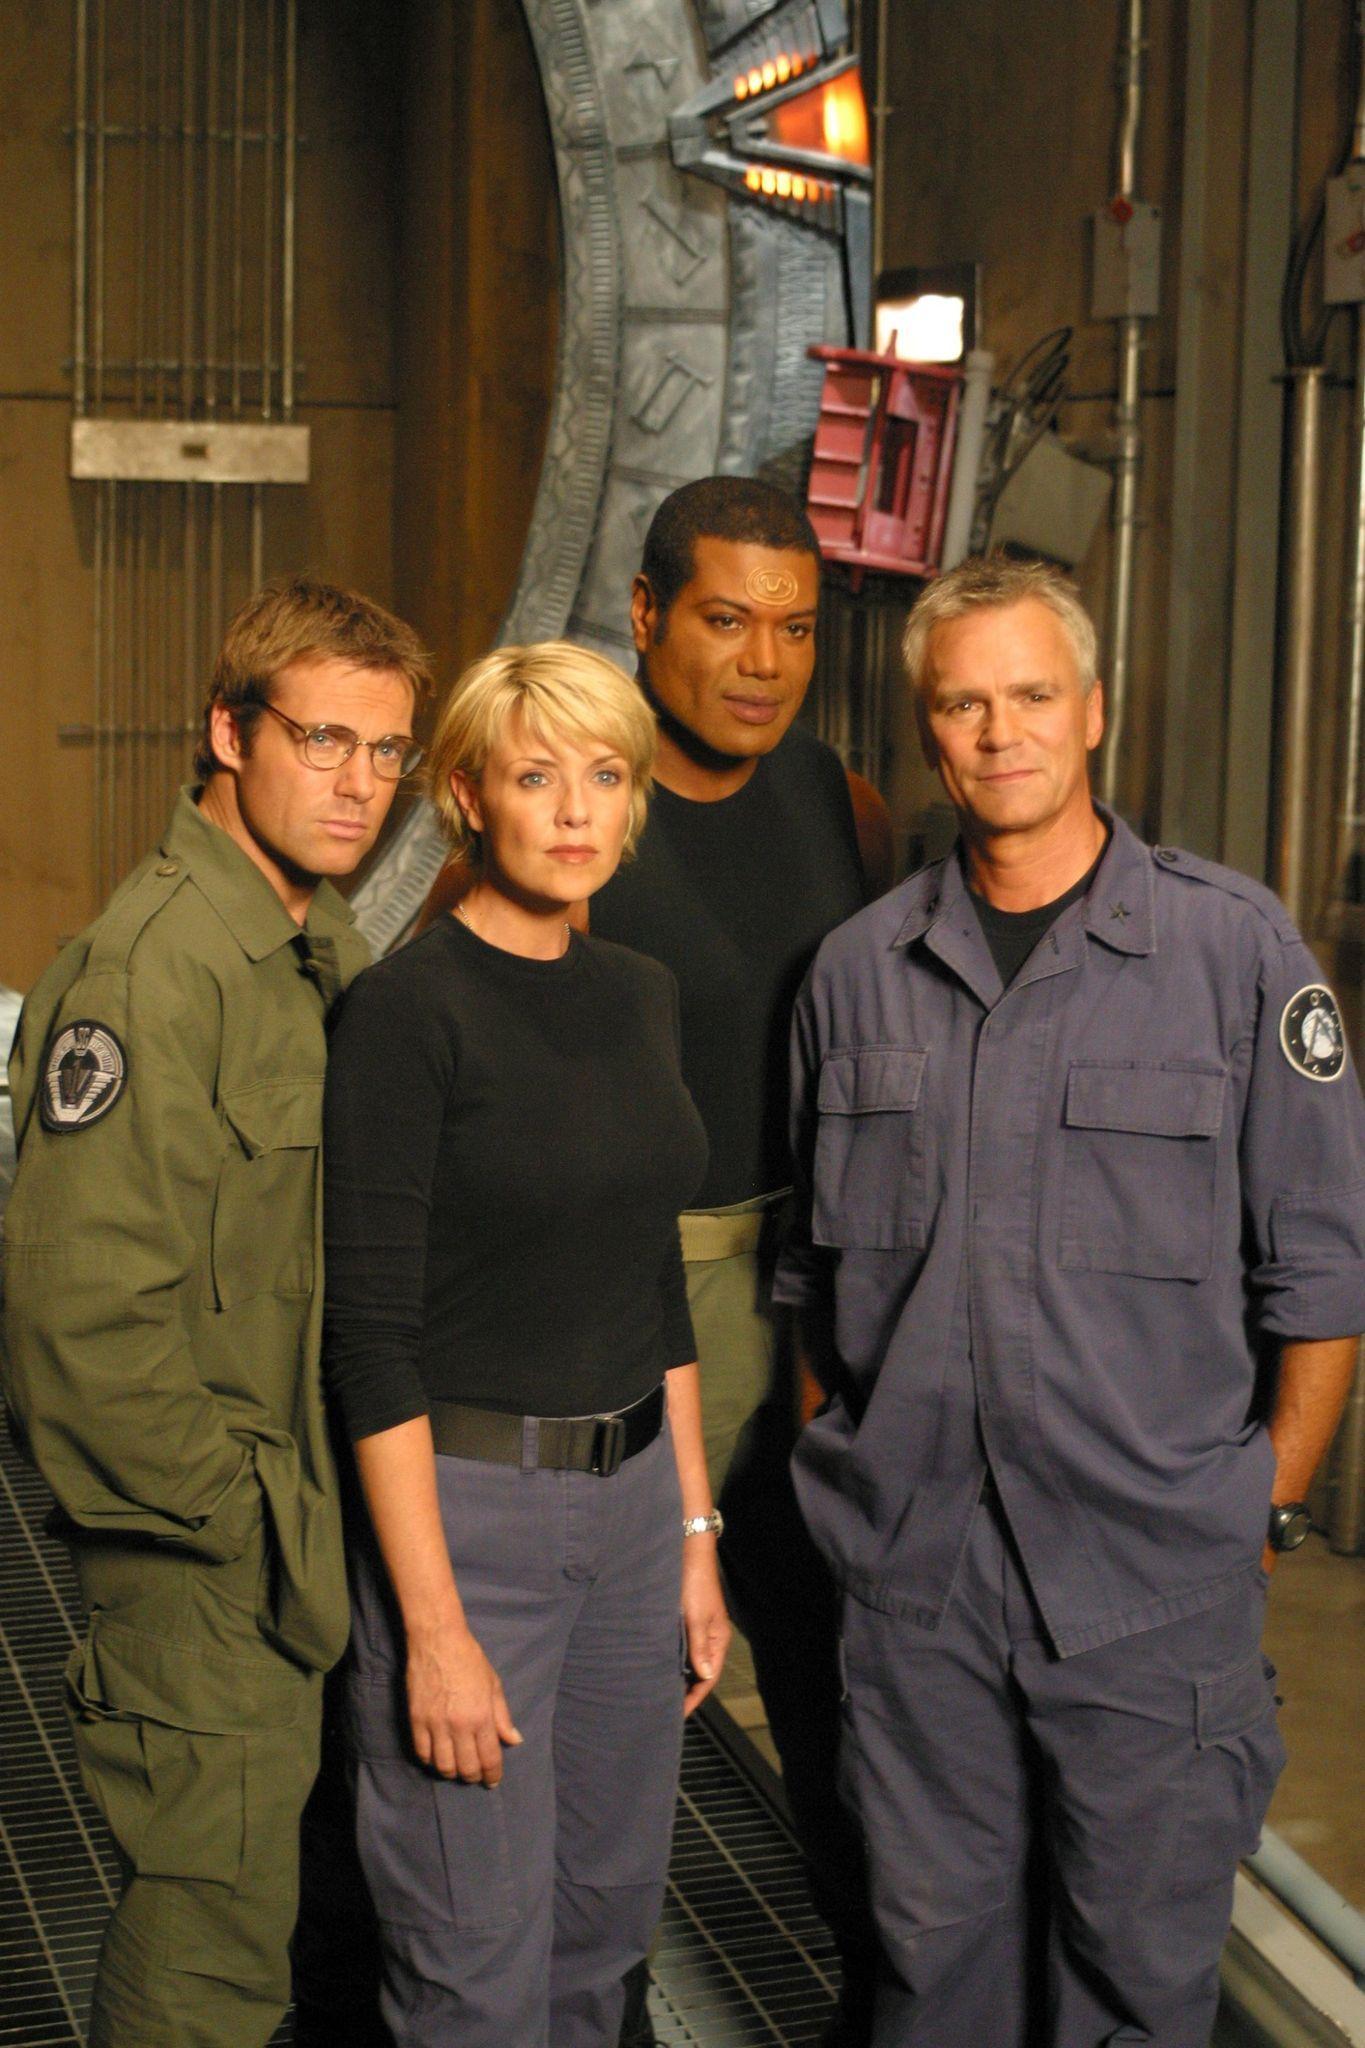 Stargate SG1 - Season 3 Promo